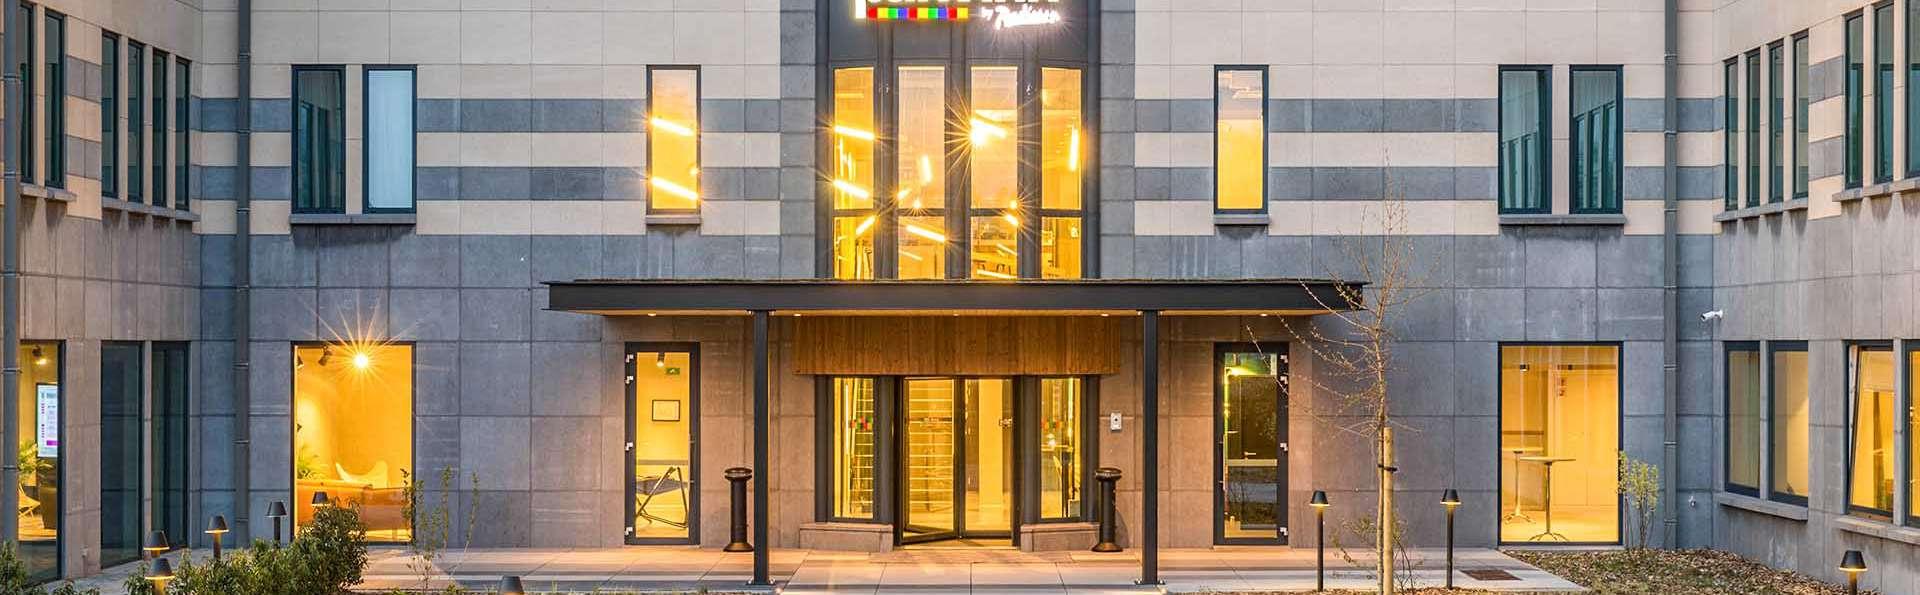 Park Inn by Radisson Brussels Airport - EDIT_Park_Inn_by_Radisson_Brussels_Airport_07.jpg